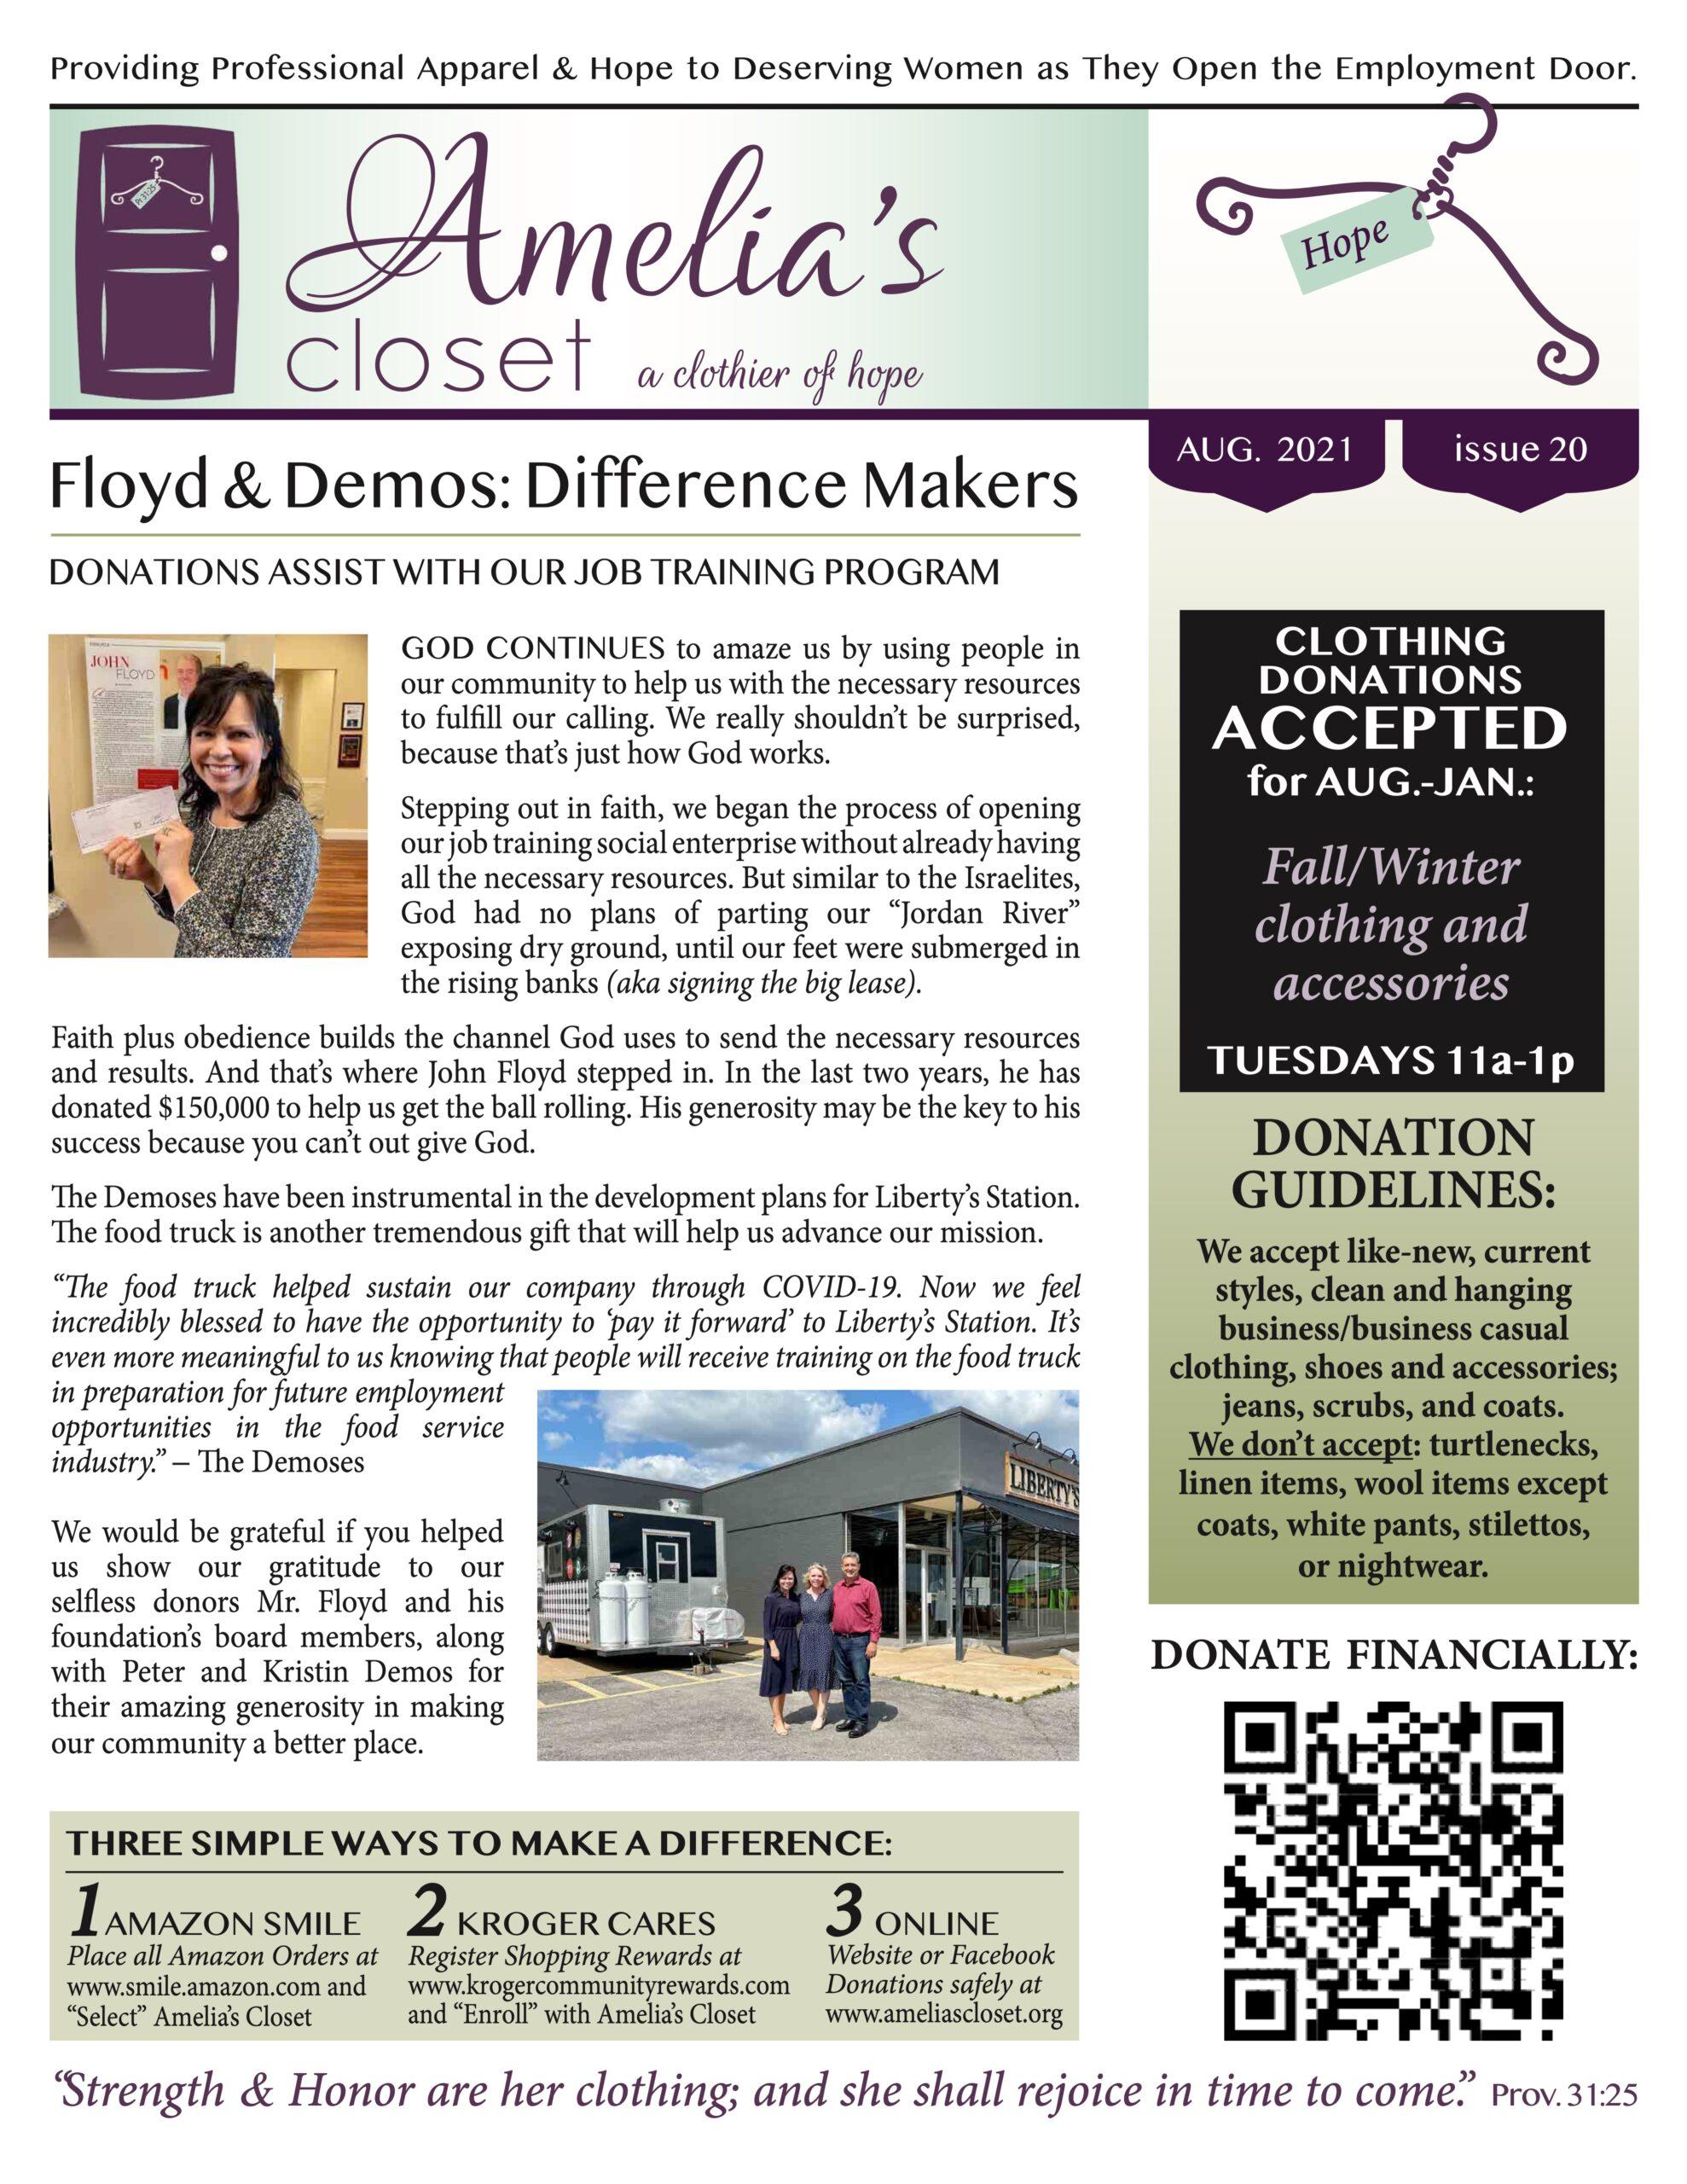 Amelias Closet Newsletter August 2021